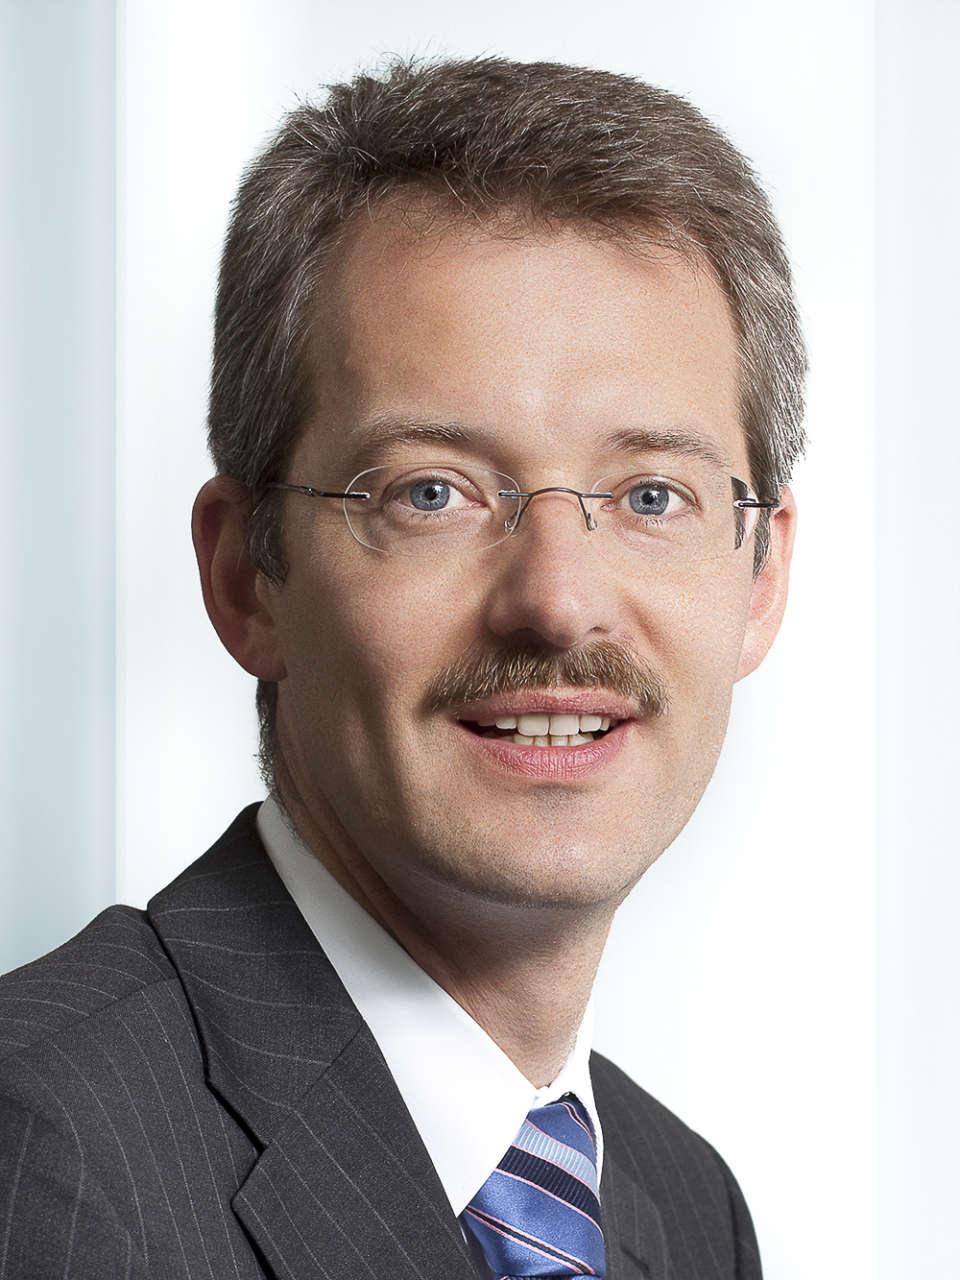 Berg Gerald Rosenberg OSI